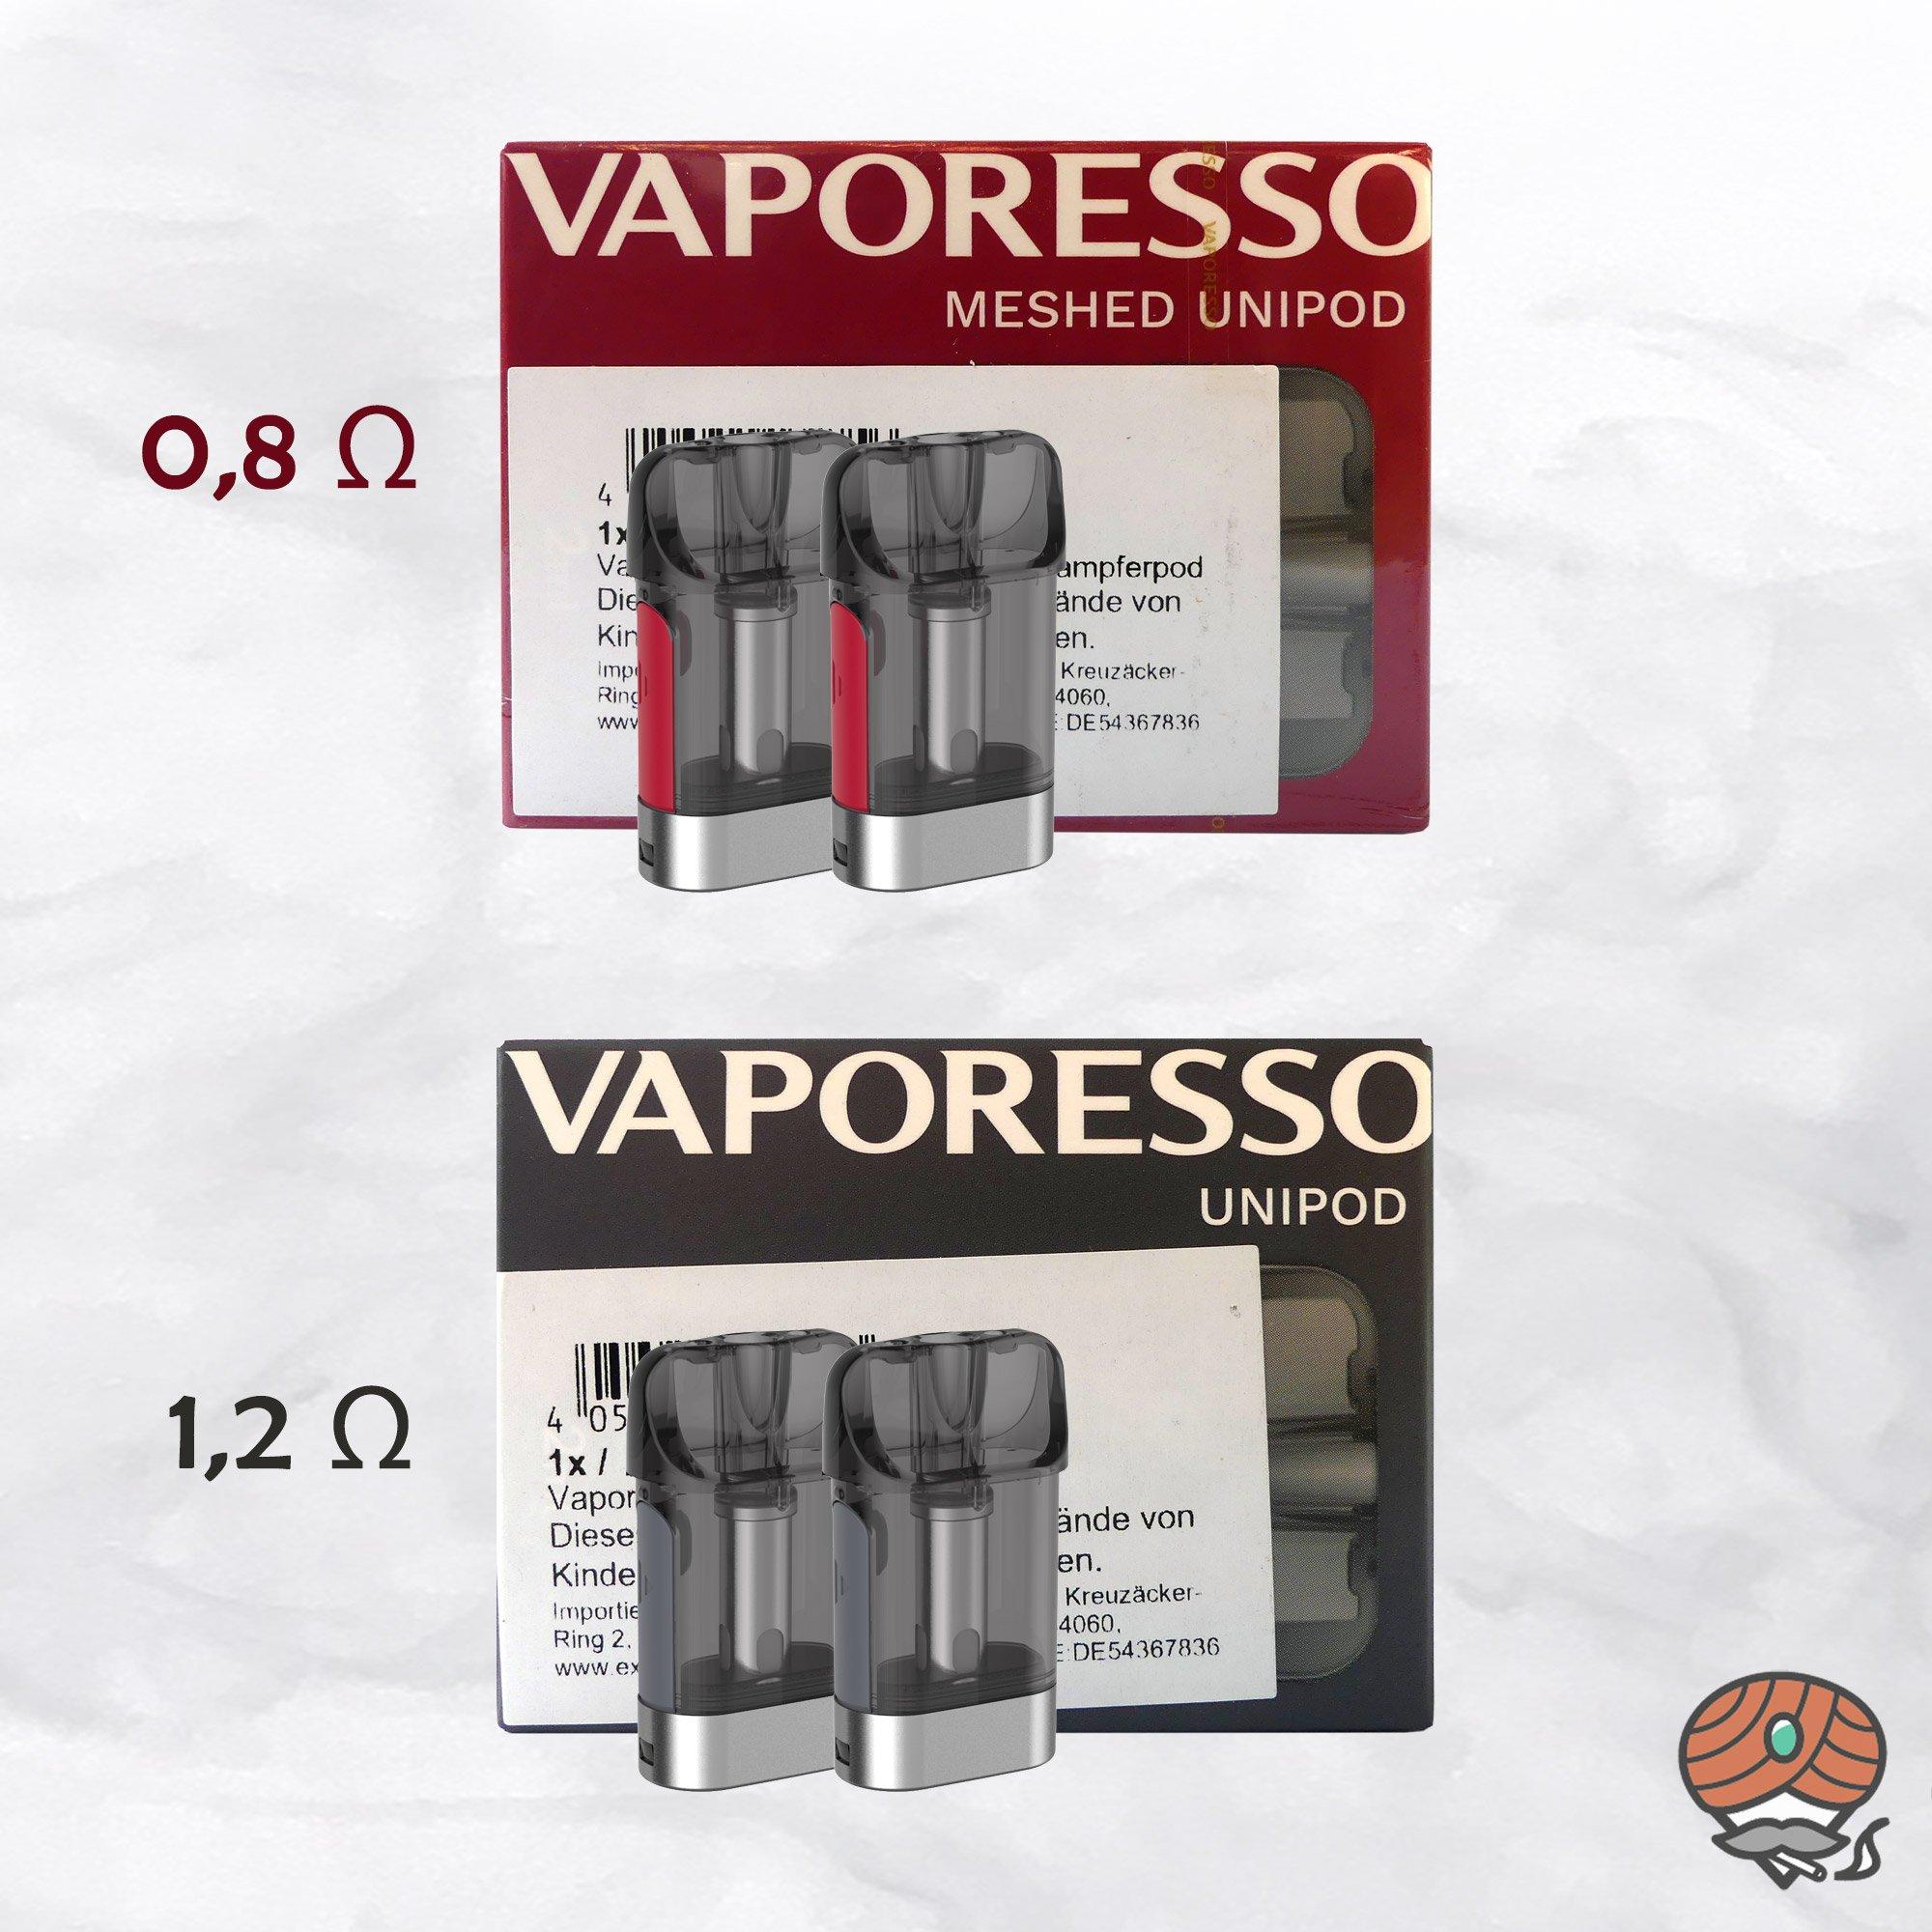 Vaporesso XTRA Pods / UNIPODS 0,8 Ω oder 1,2 Ω wählbar